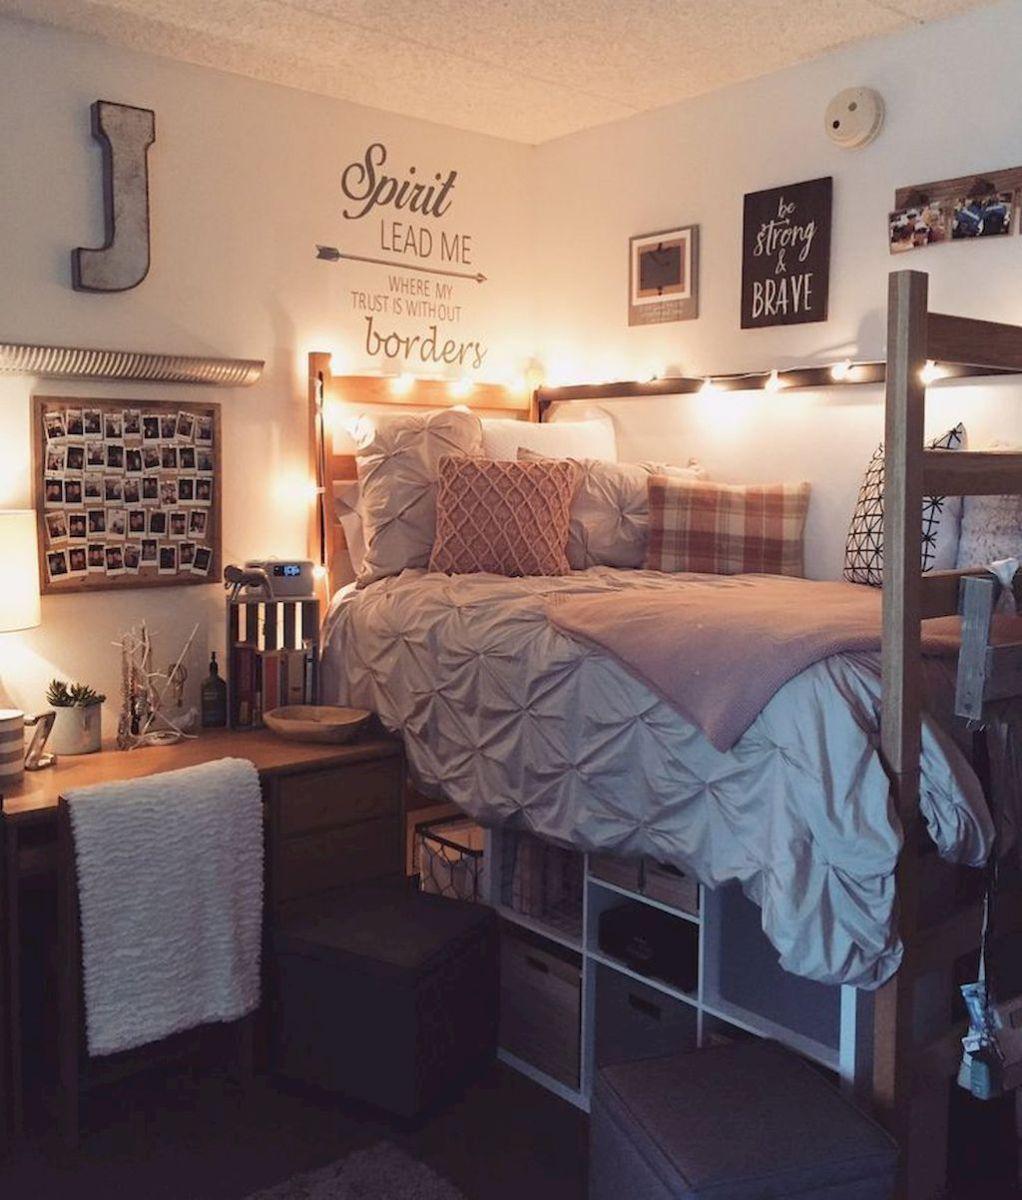 15 Creative Dorm Room Decor Ideas On A Budget Dorm Room Diy